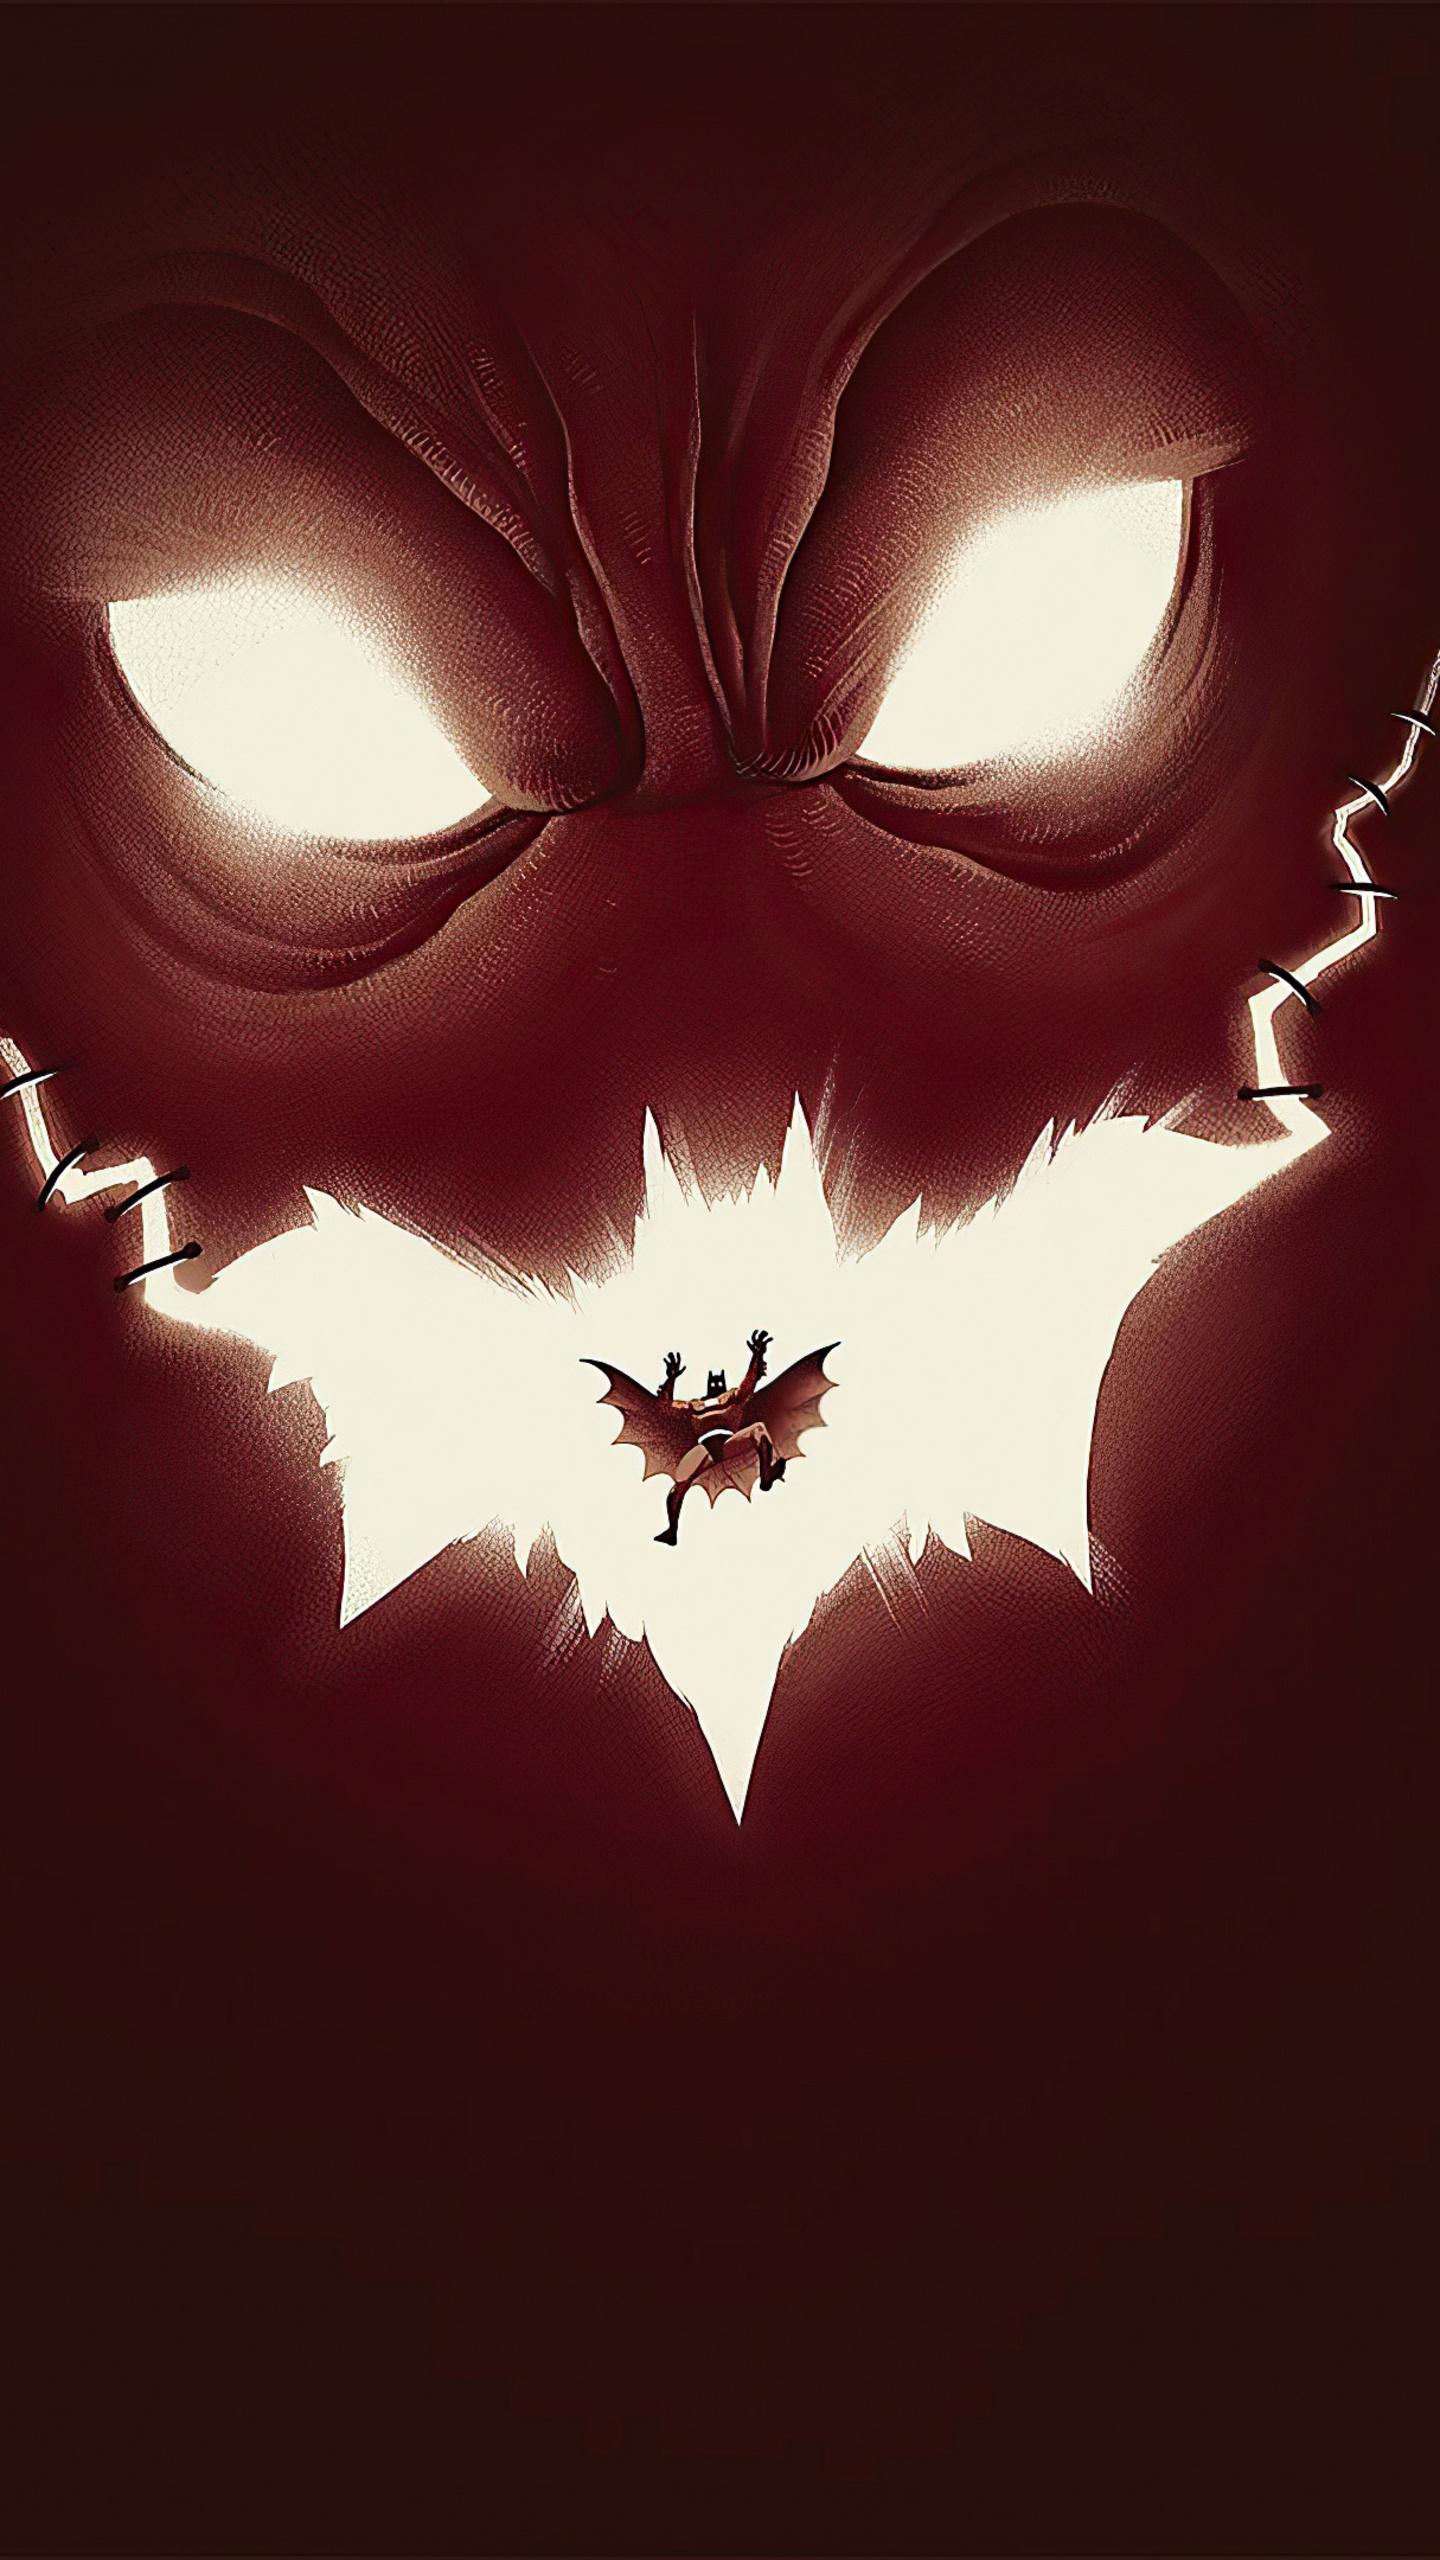 batman-nothing-to-fear-ev.jpg